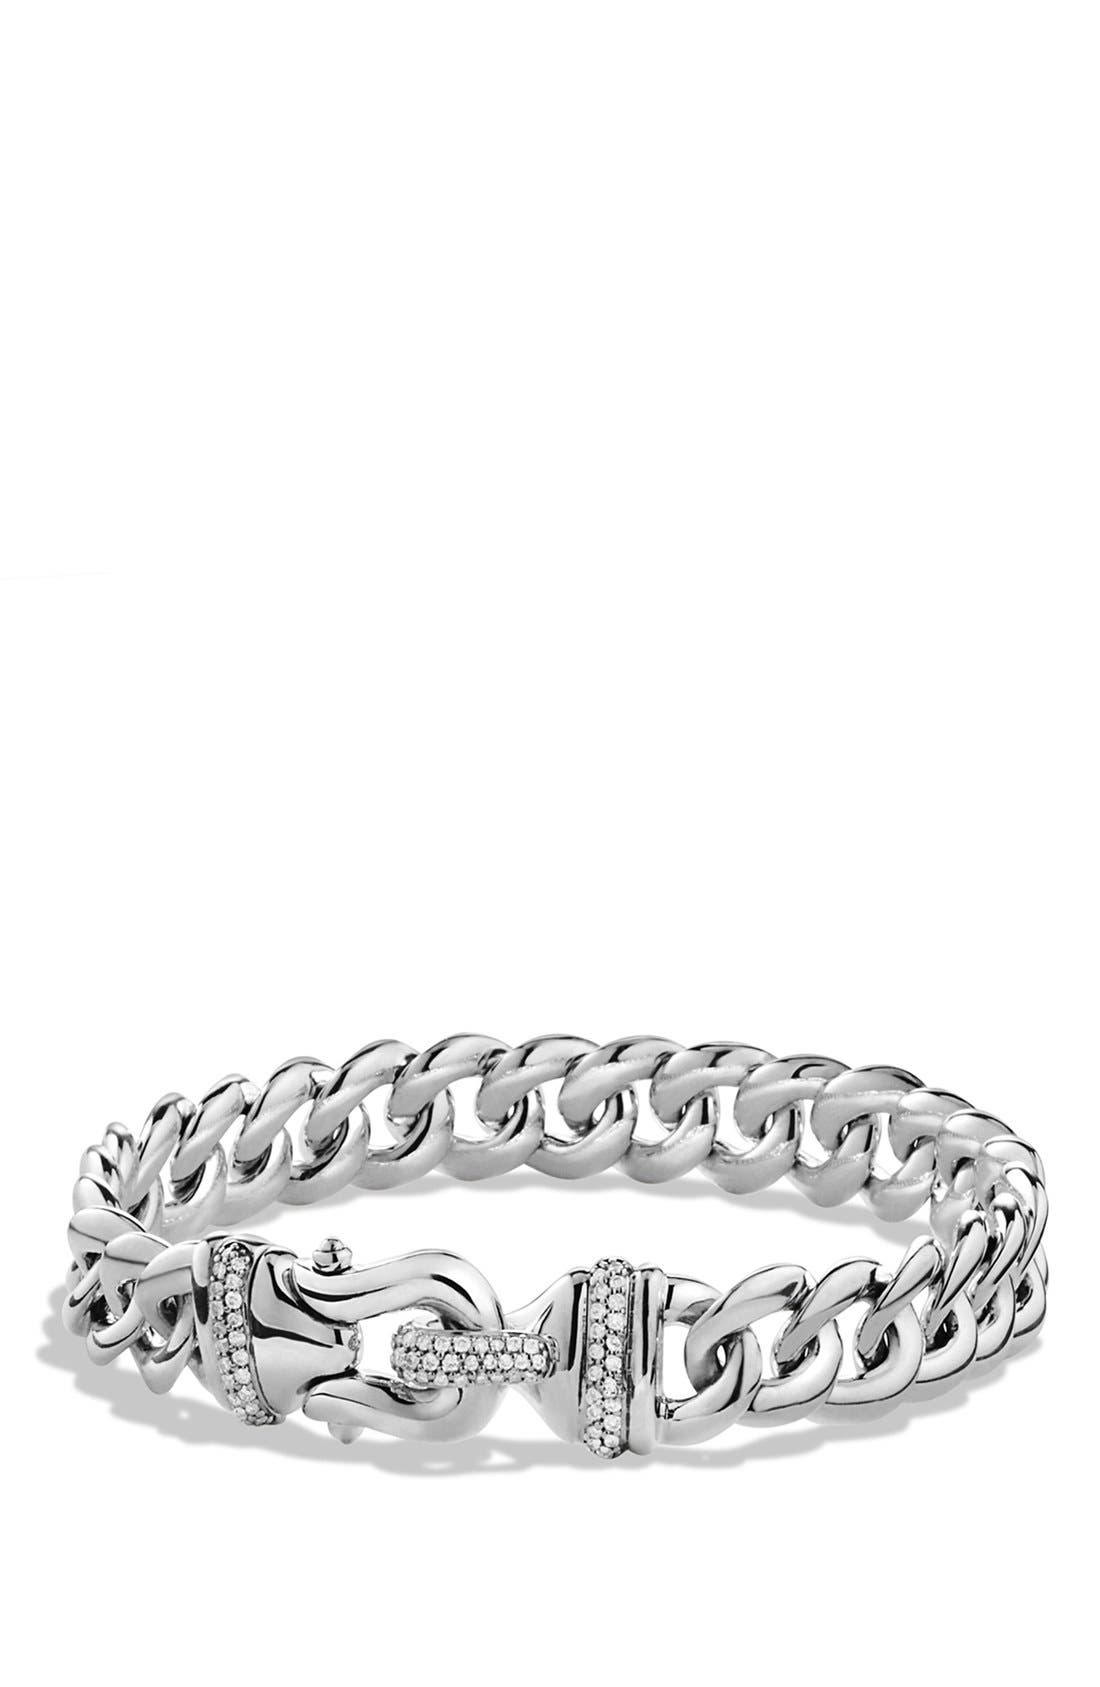 Alternate Image 1 Selected - David Yurman 'Buckle' Single-Row Bracelet with Diamonds